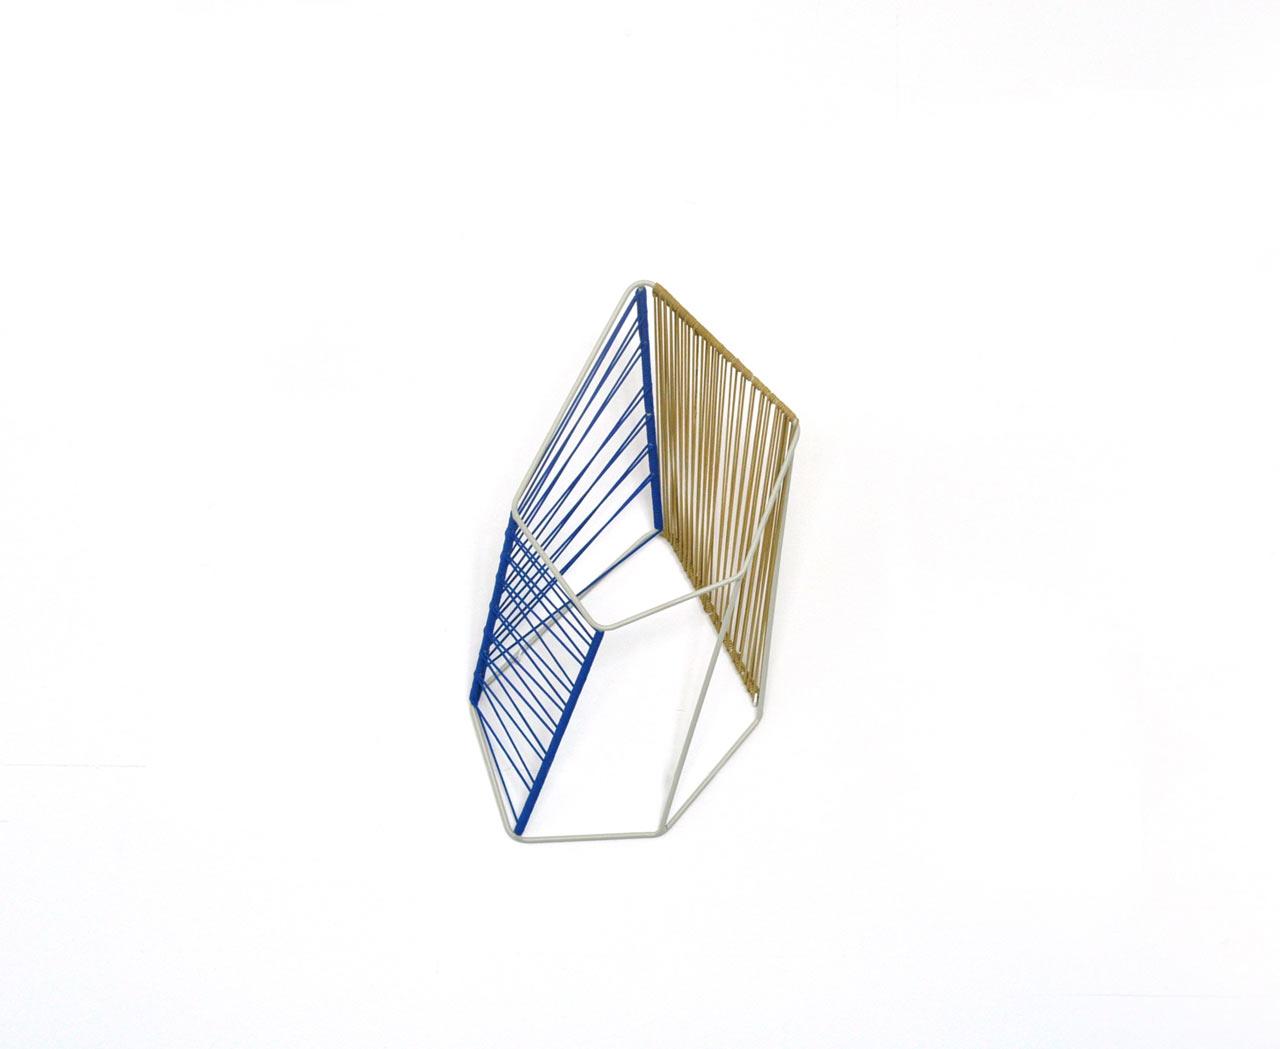 Quadrat-Dahm-Lee-8